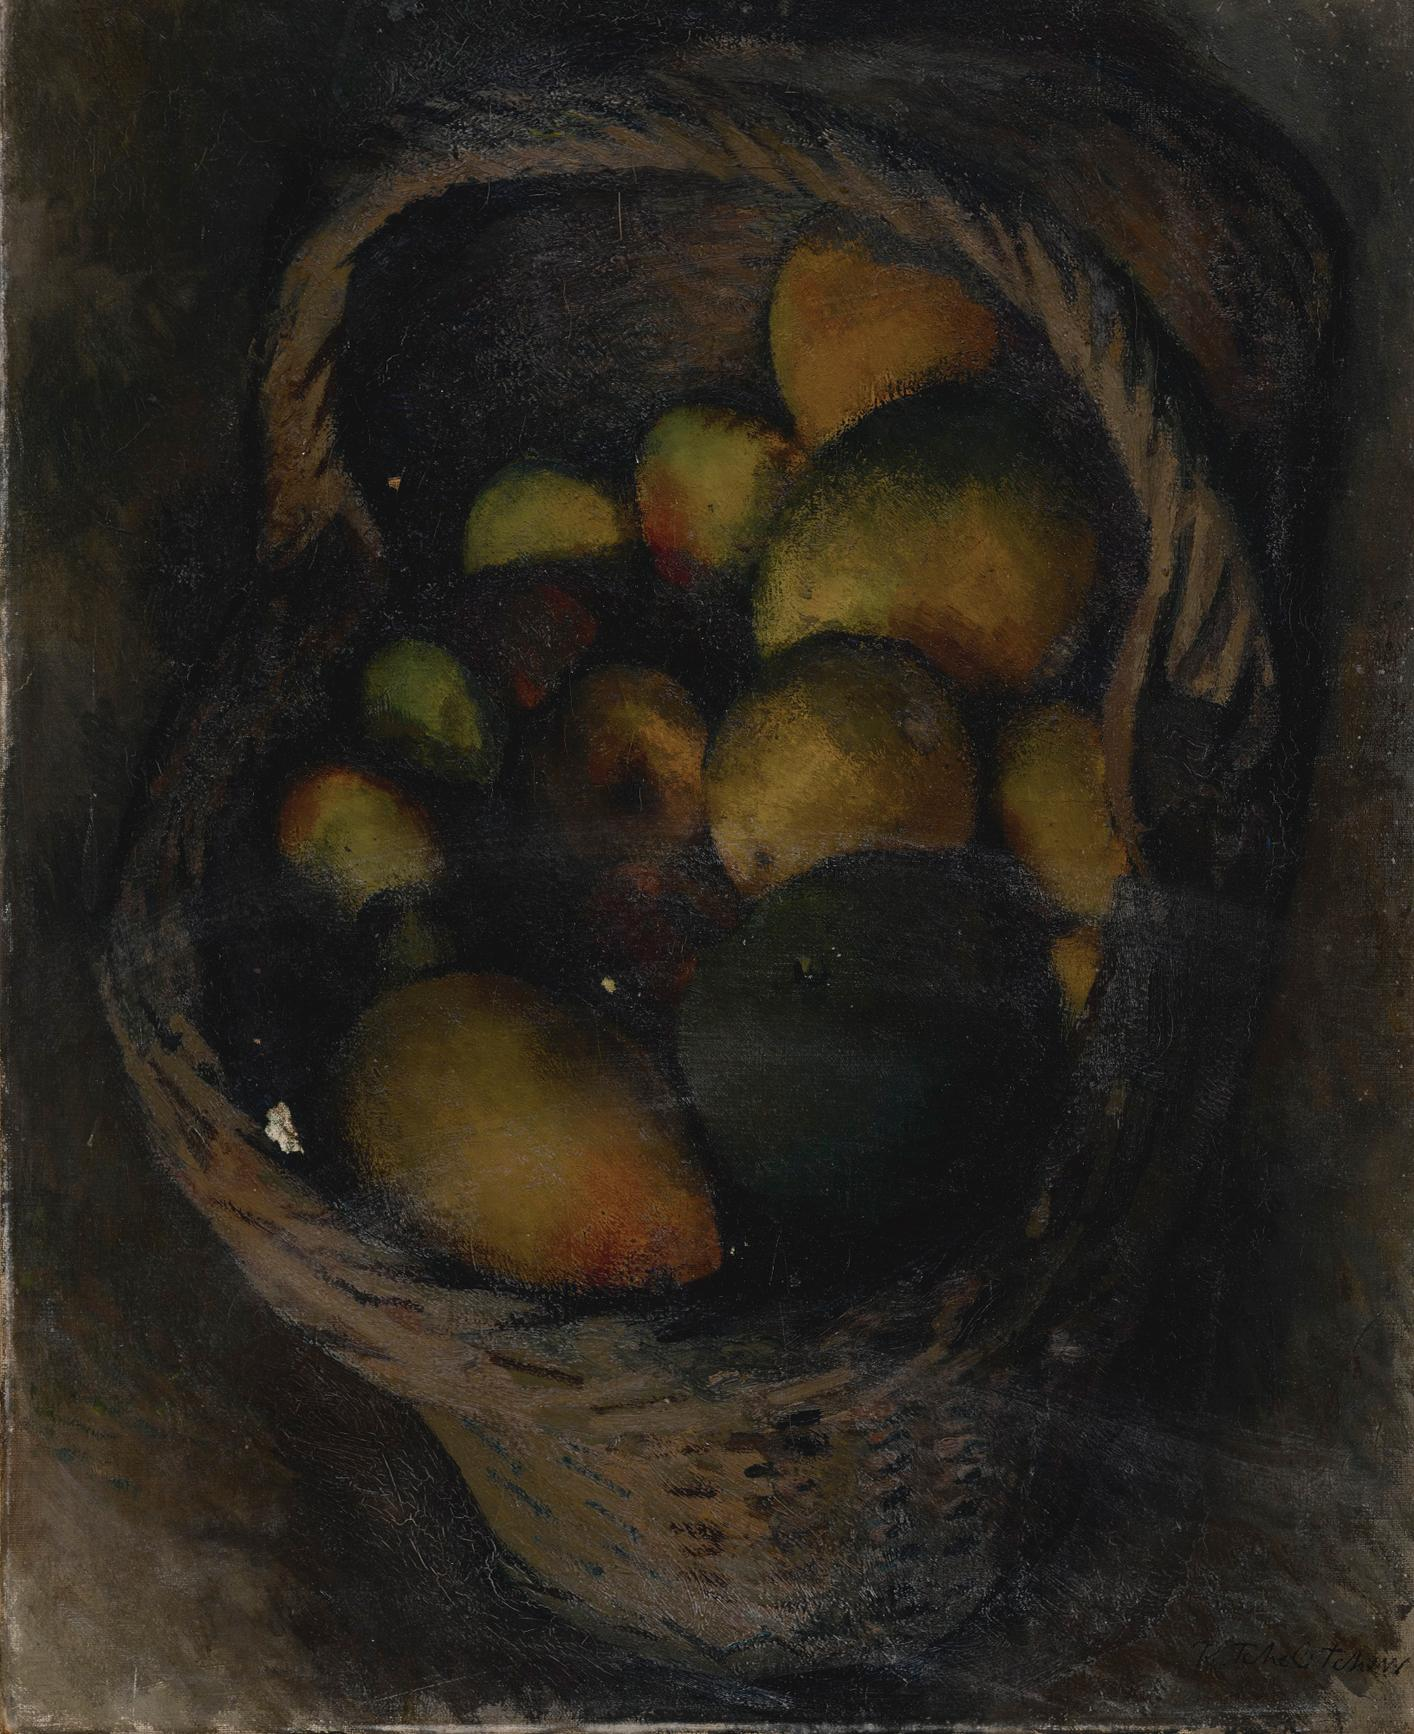 Pavel Tchelitchew - Still Life-1926